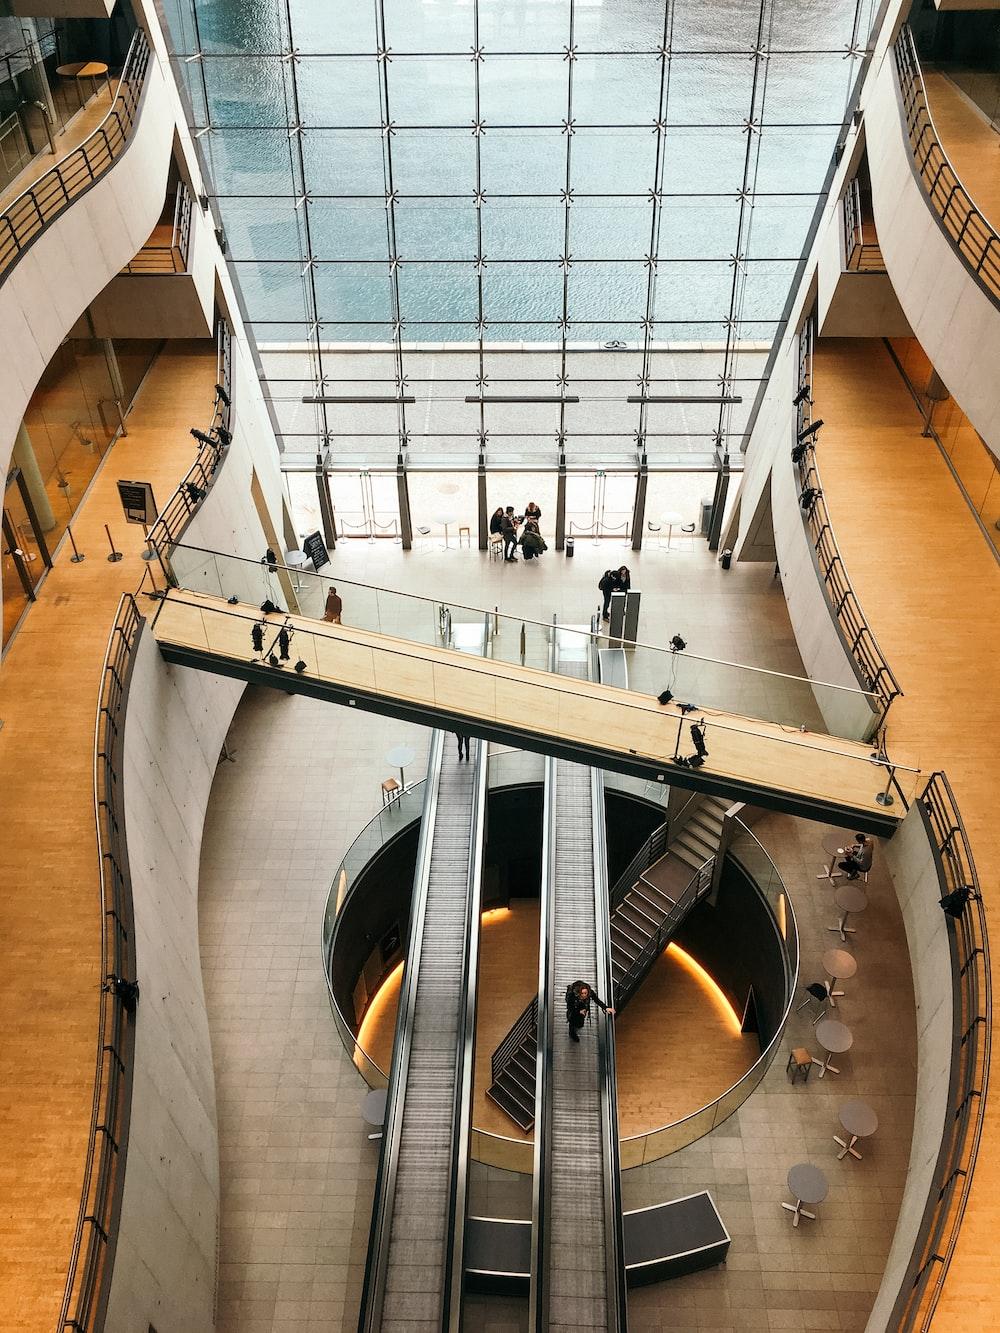 aerial photo of person using escalator indoors